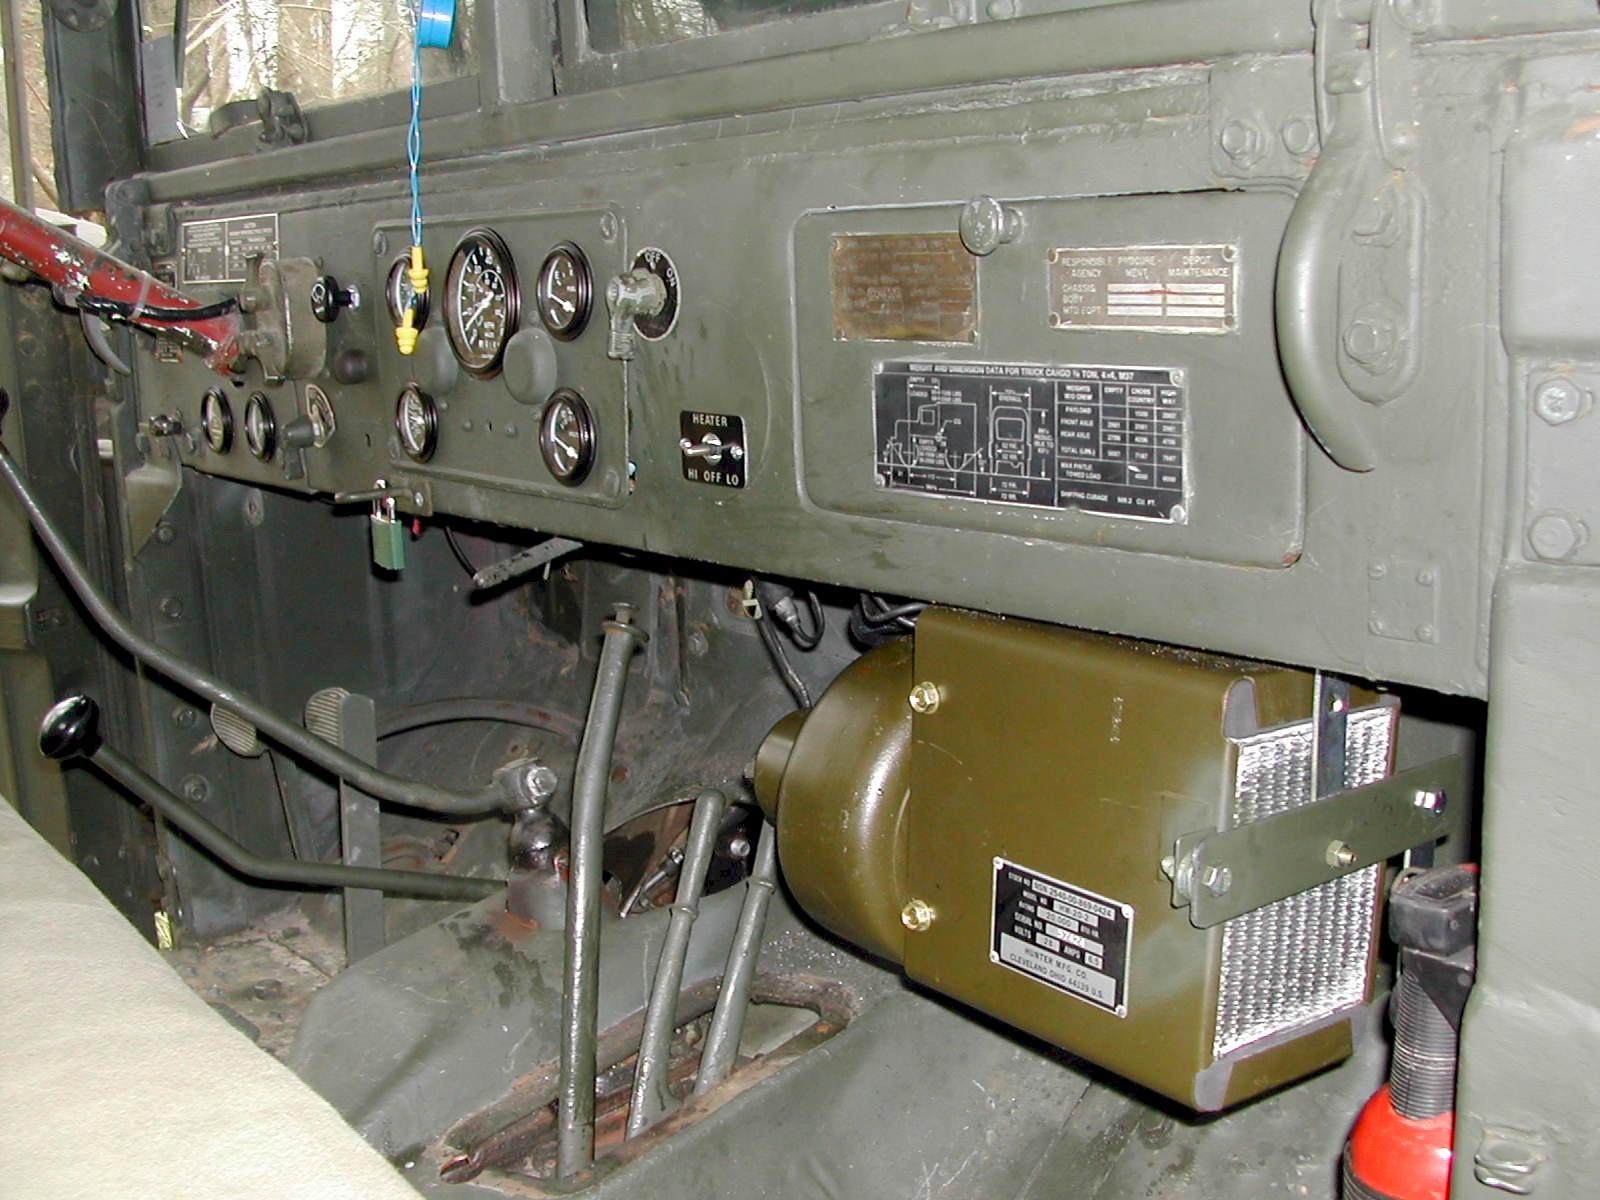 Wiring A Water Heater To Breaker Box